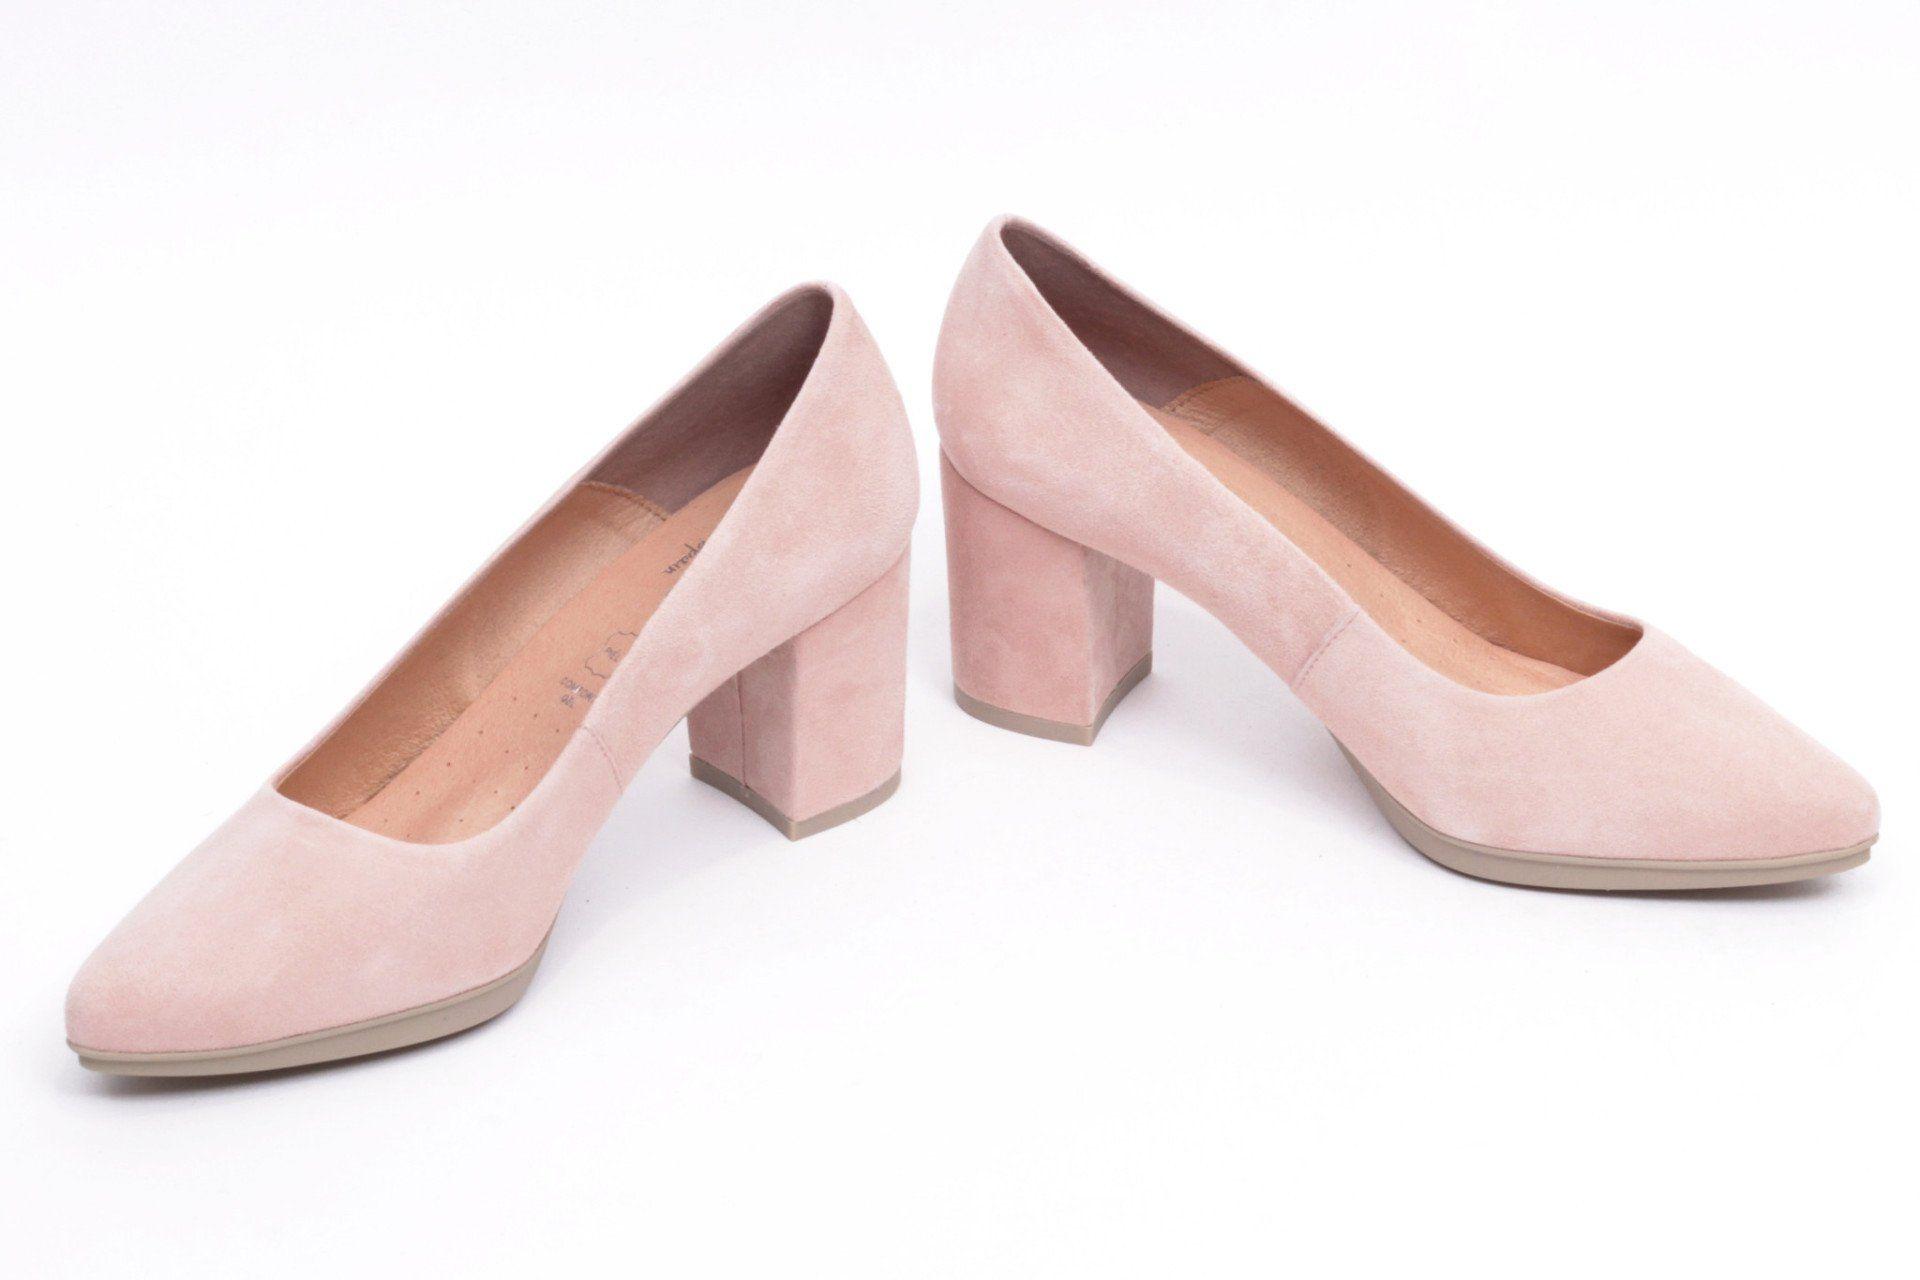 miMaO Urban S Rosa Lady – Zapato mujer salon de tacon rosa vestir cómodo  maquillaje - women high heels shoes sand pink make up color comfort pumps d47b0e6fef6f